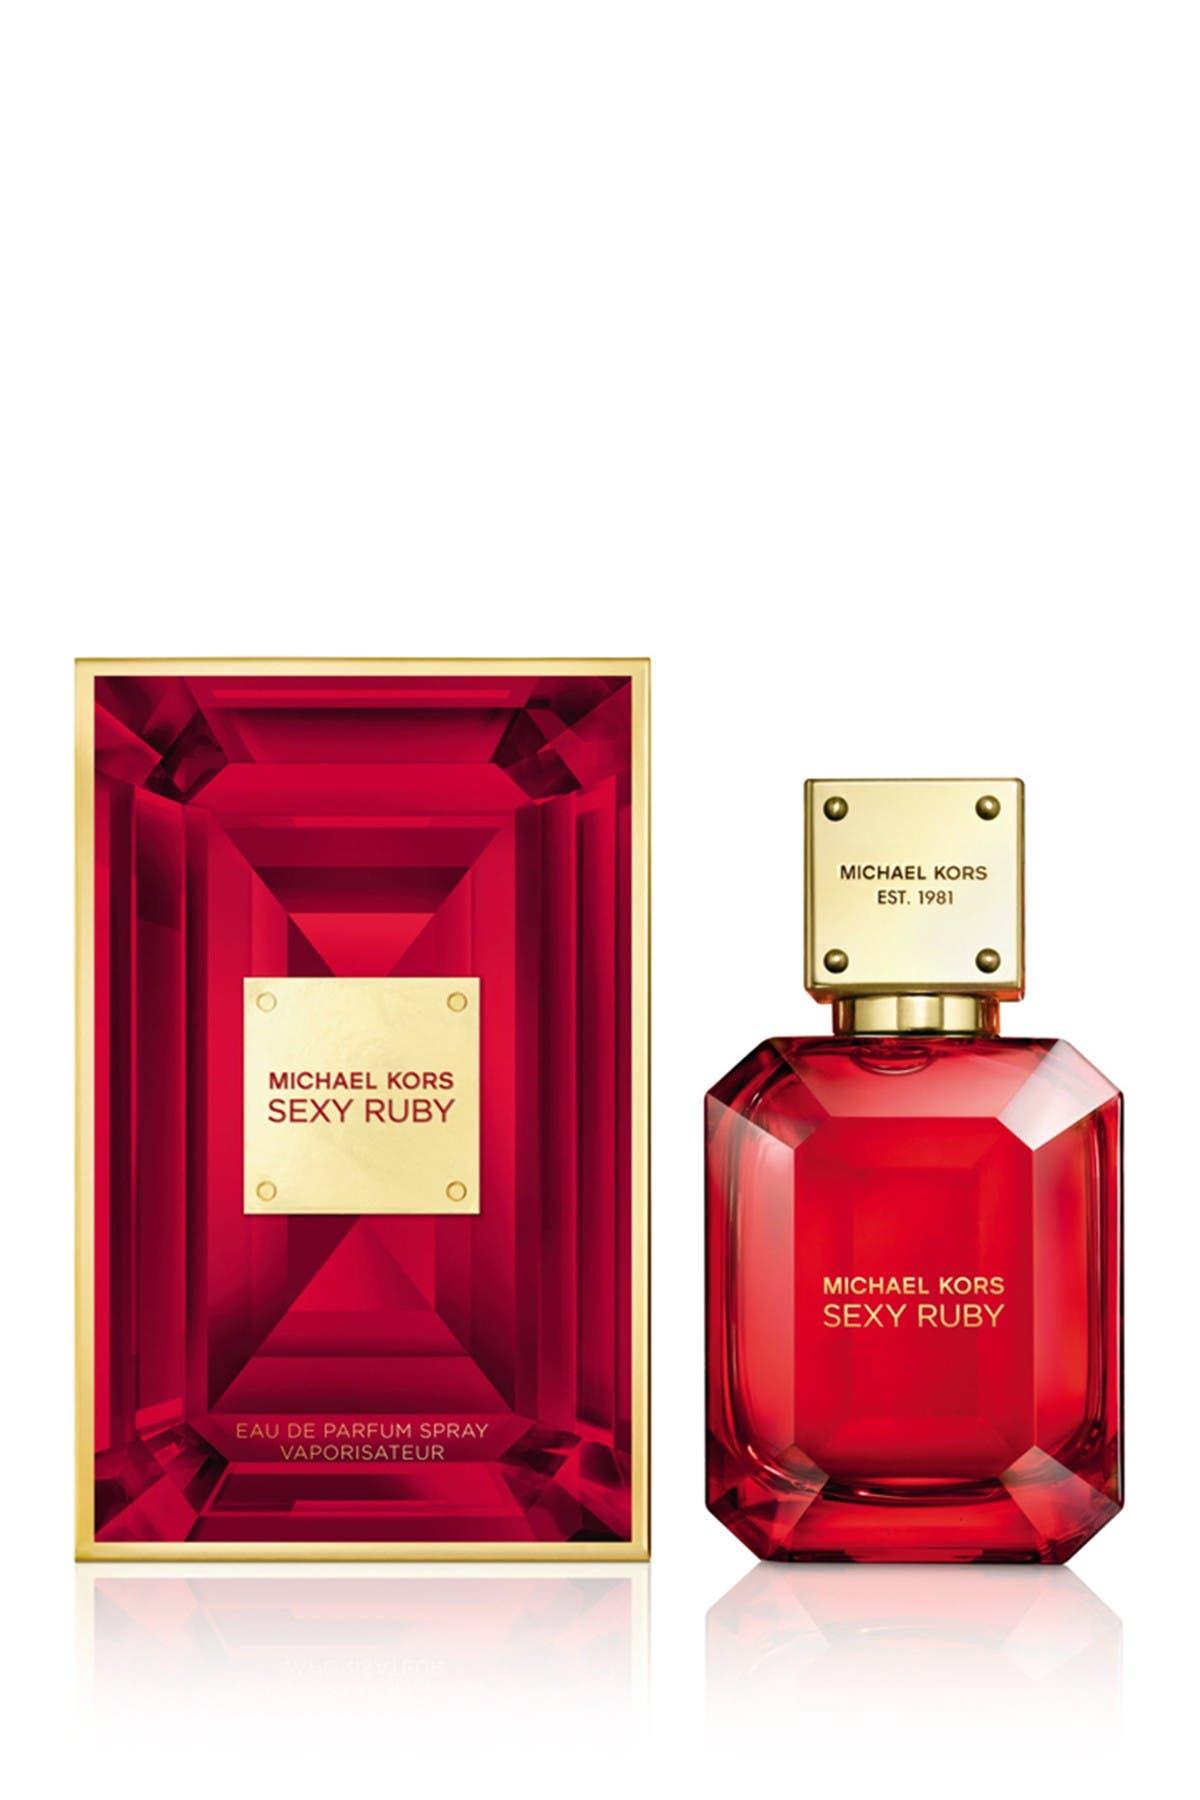 Image of Michael Kors Sexy Ruby Eau de Parfum Spray - 1.7 fl. oz.